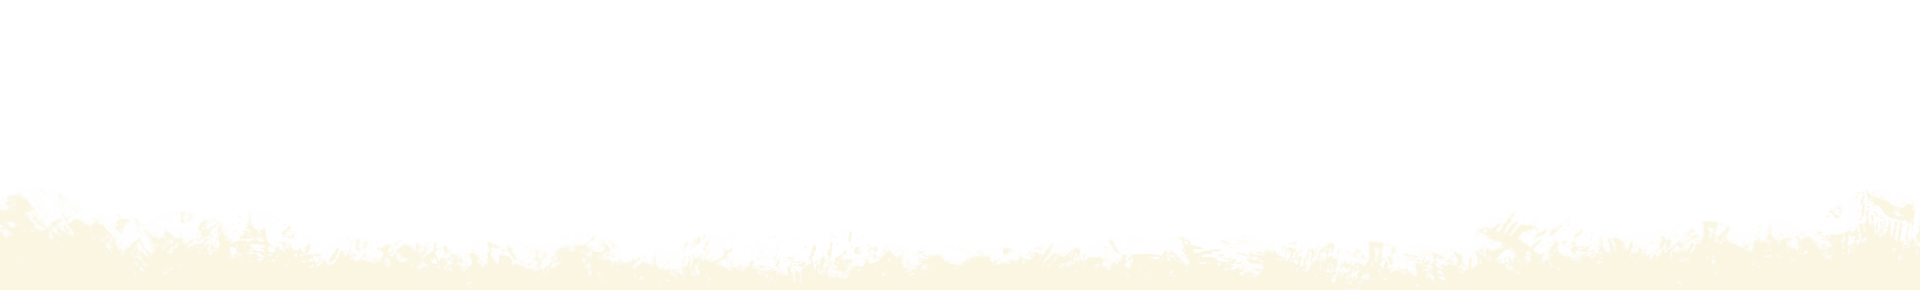 row-separator-2